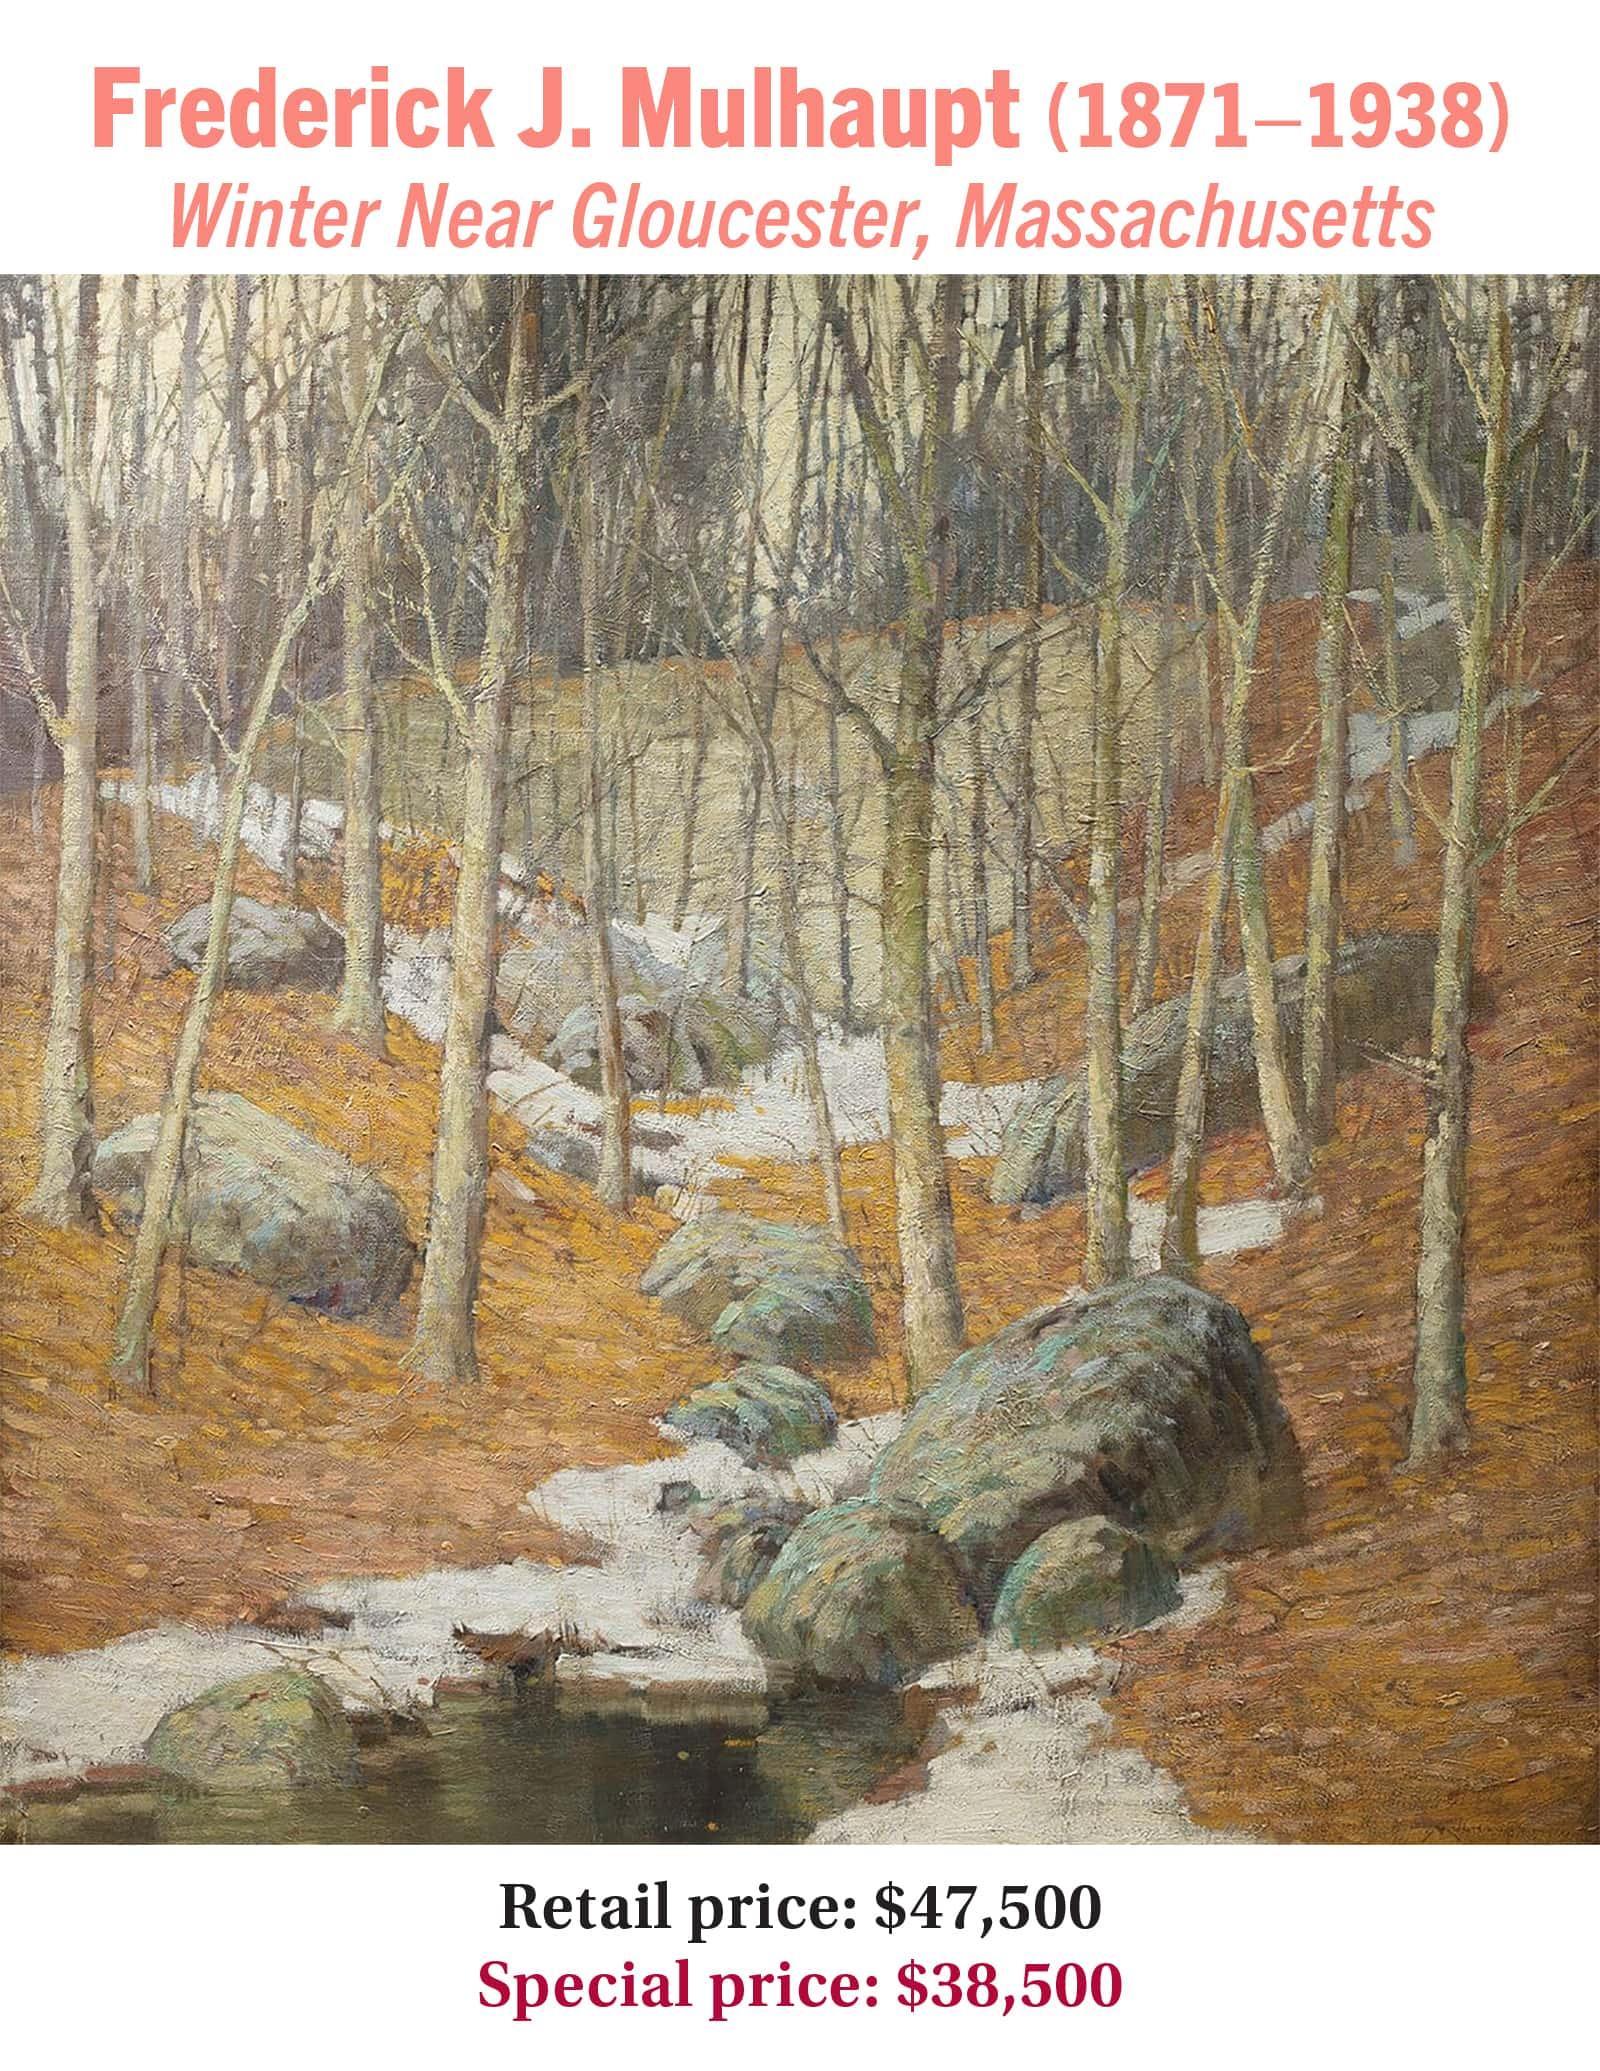 Frederick J. Mulhaupt (1871–1938), Winter Near Gloucester, Massachusetts, oil on canvas, American impressionist landscape painting